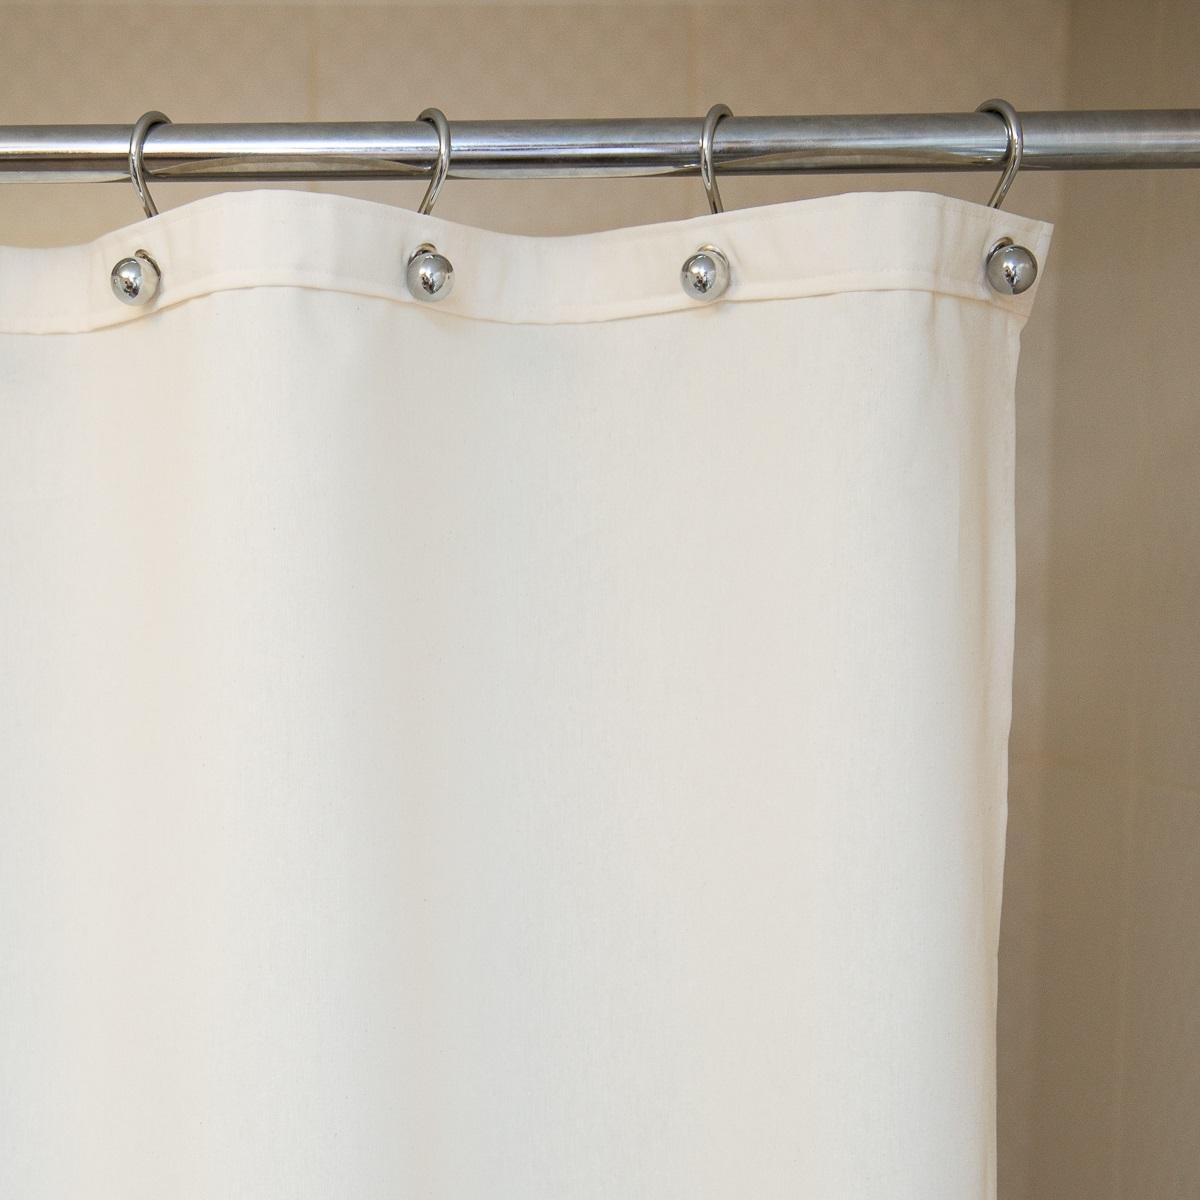 Шторки Защитная шторка для ванной 180х200 Arti-Deco Liso Beige elitnaya-shtorka-dlya-vannoy-240h200-liso-beige-ot-arti-deco-ispaniya.jpg